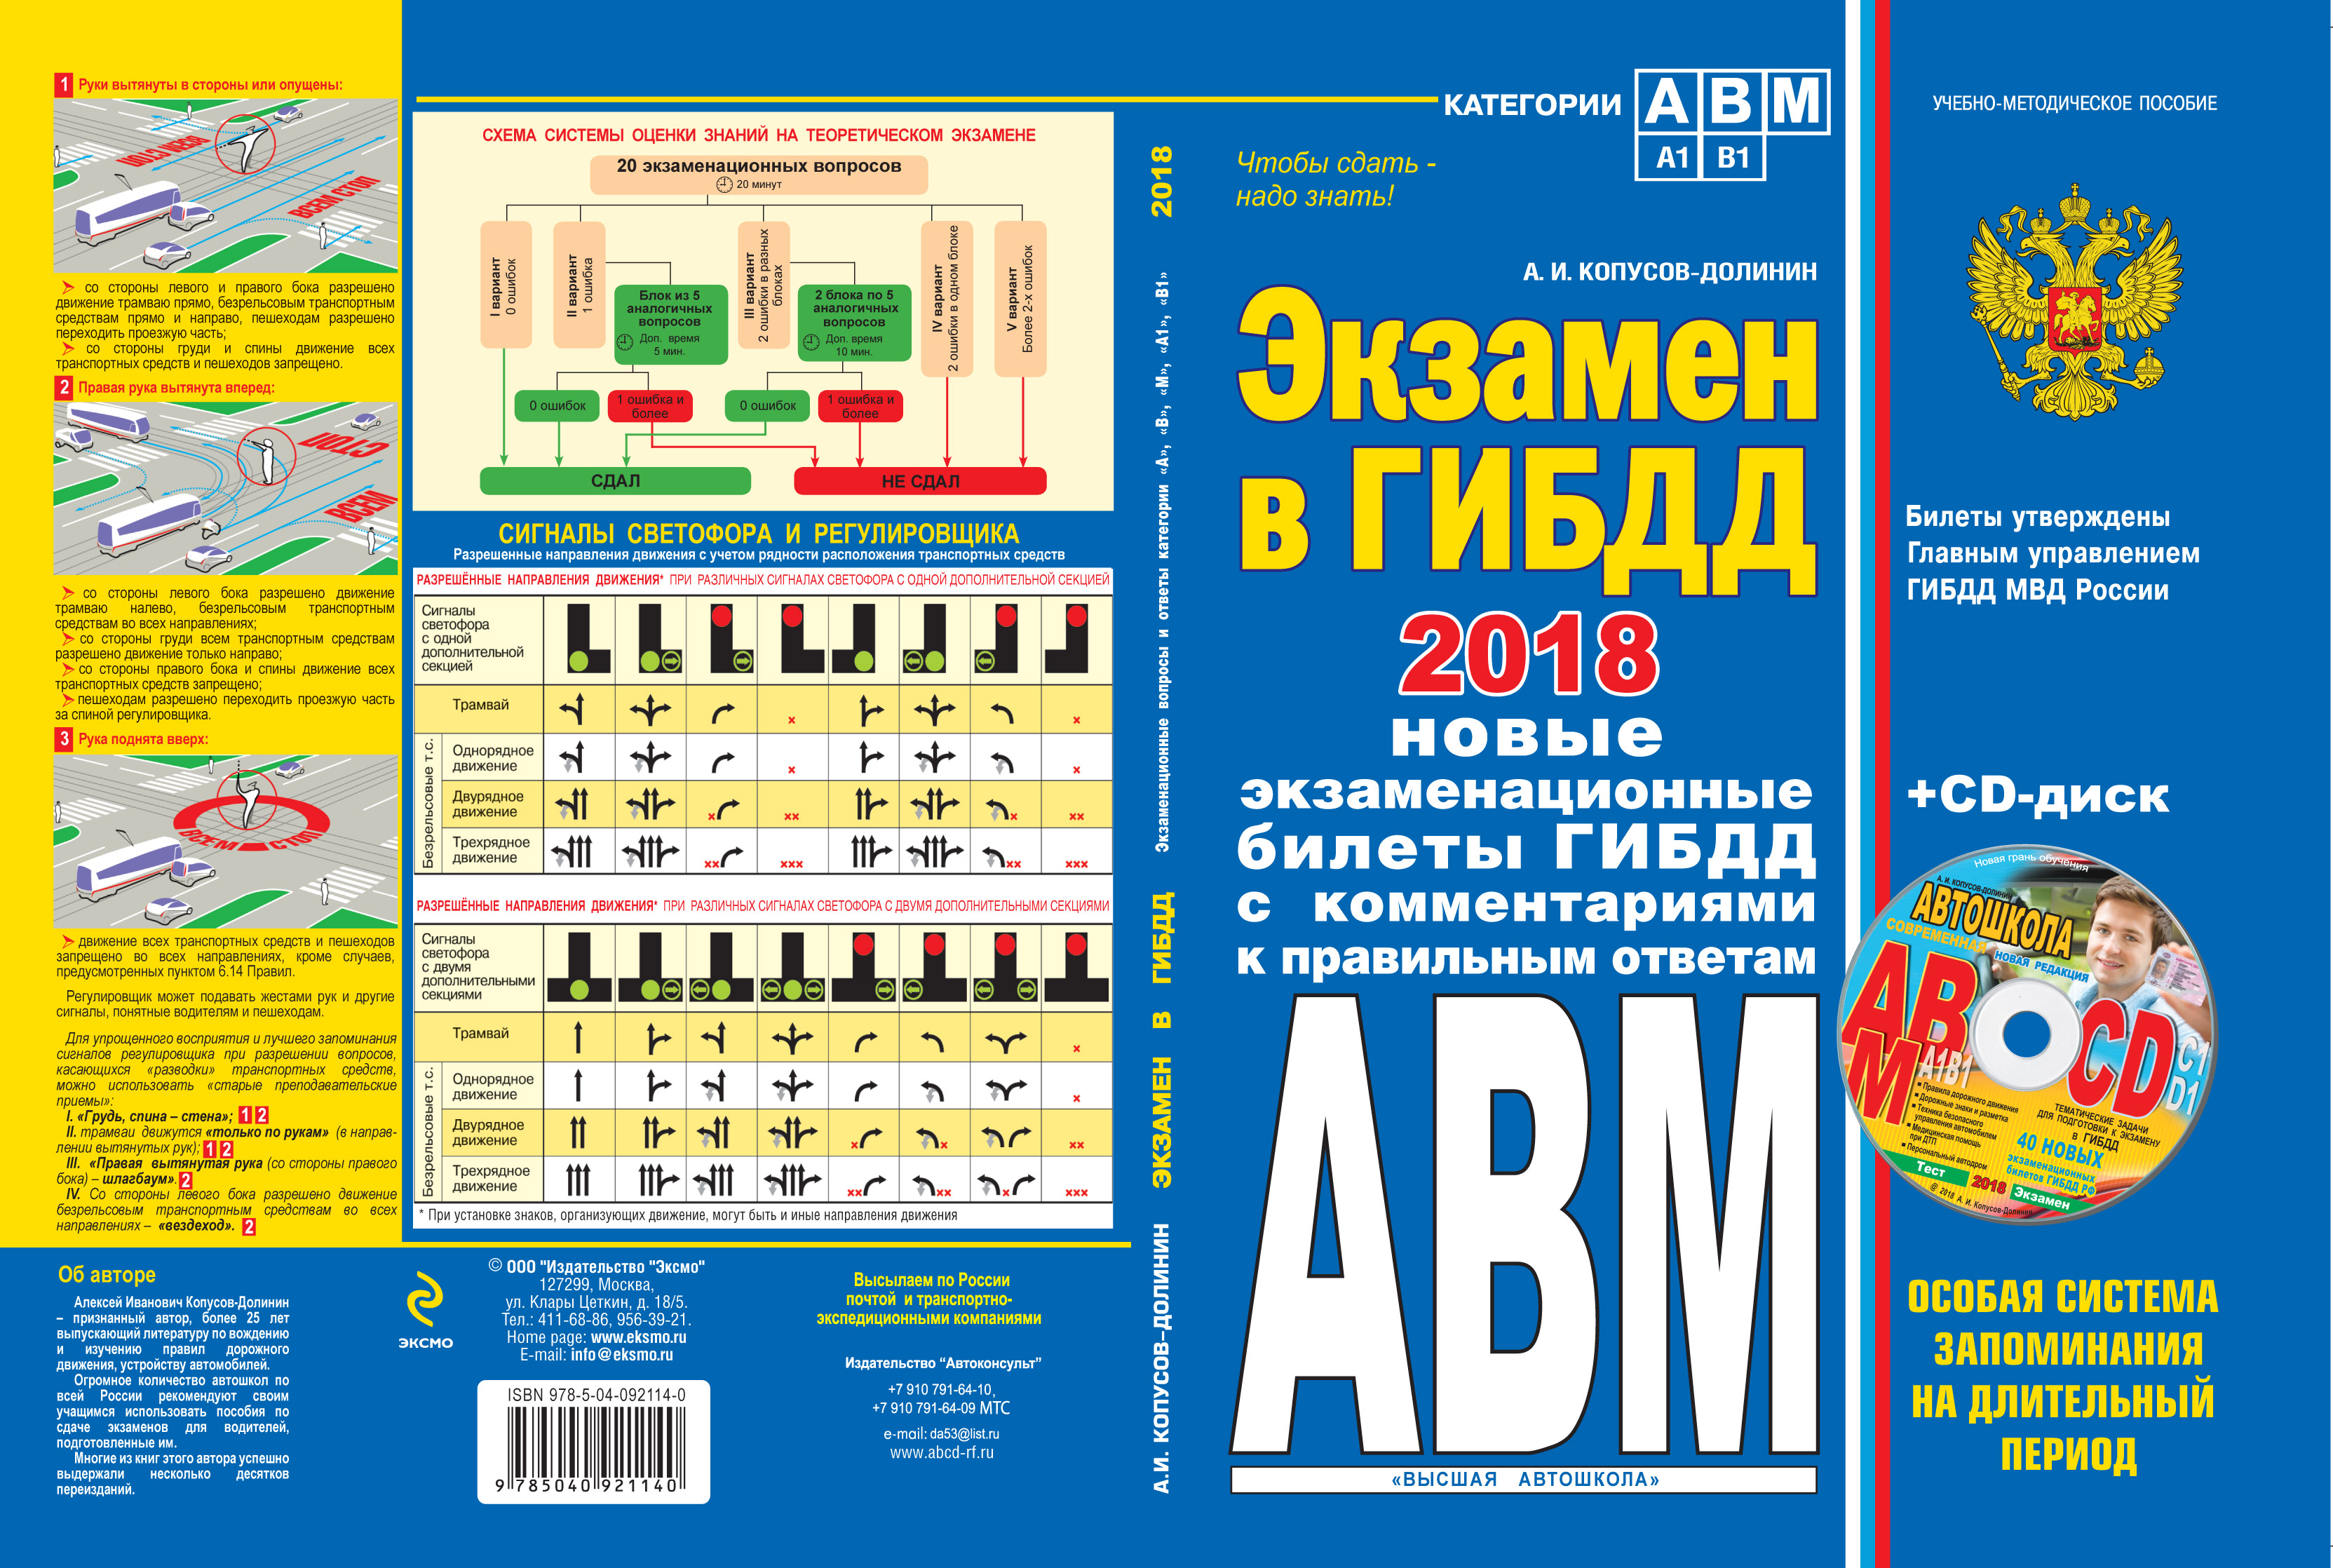 Копусов-Долинин А.И. Экзамен в ГИБДД. Категории А, В, M, подкатегории A1. B1. 2018 год (+CD) билеты для экзамена в гибдд категории а b m с программой подготовки и тестирования с изменениями от 04 04 17